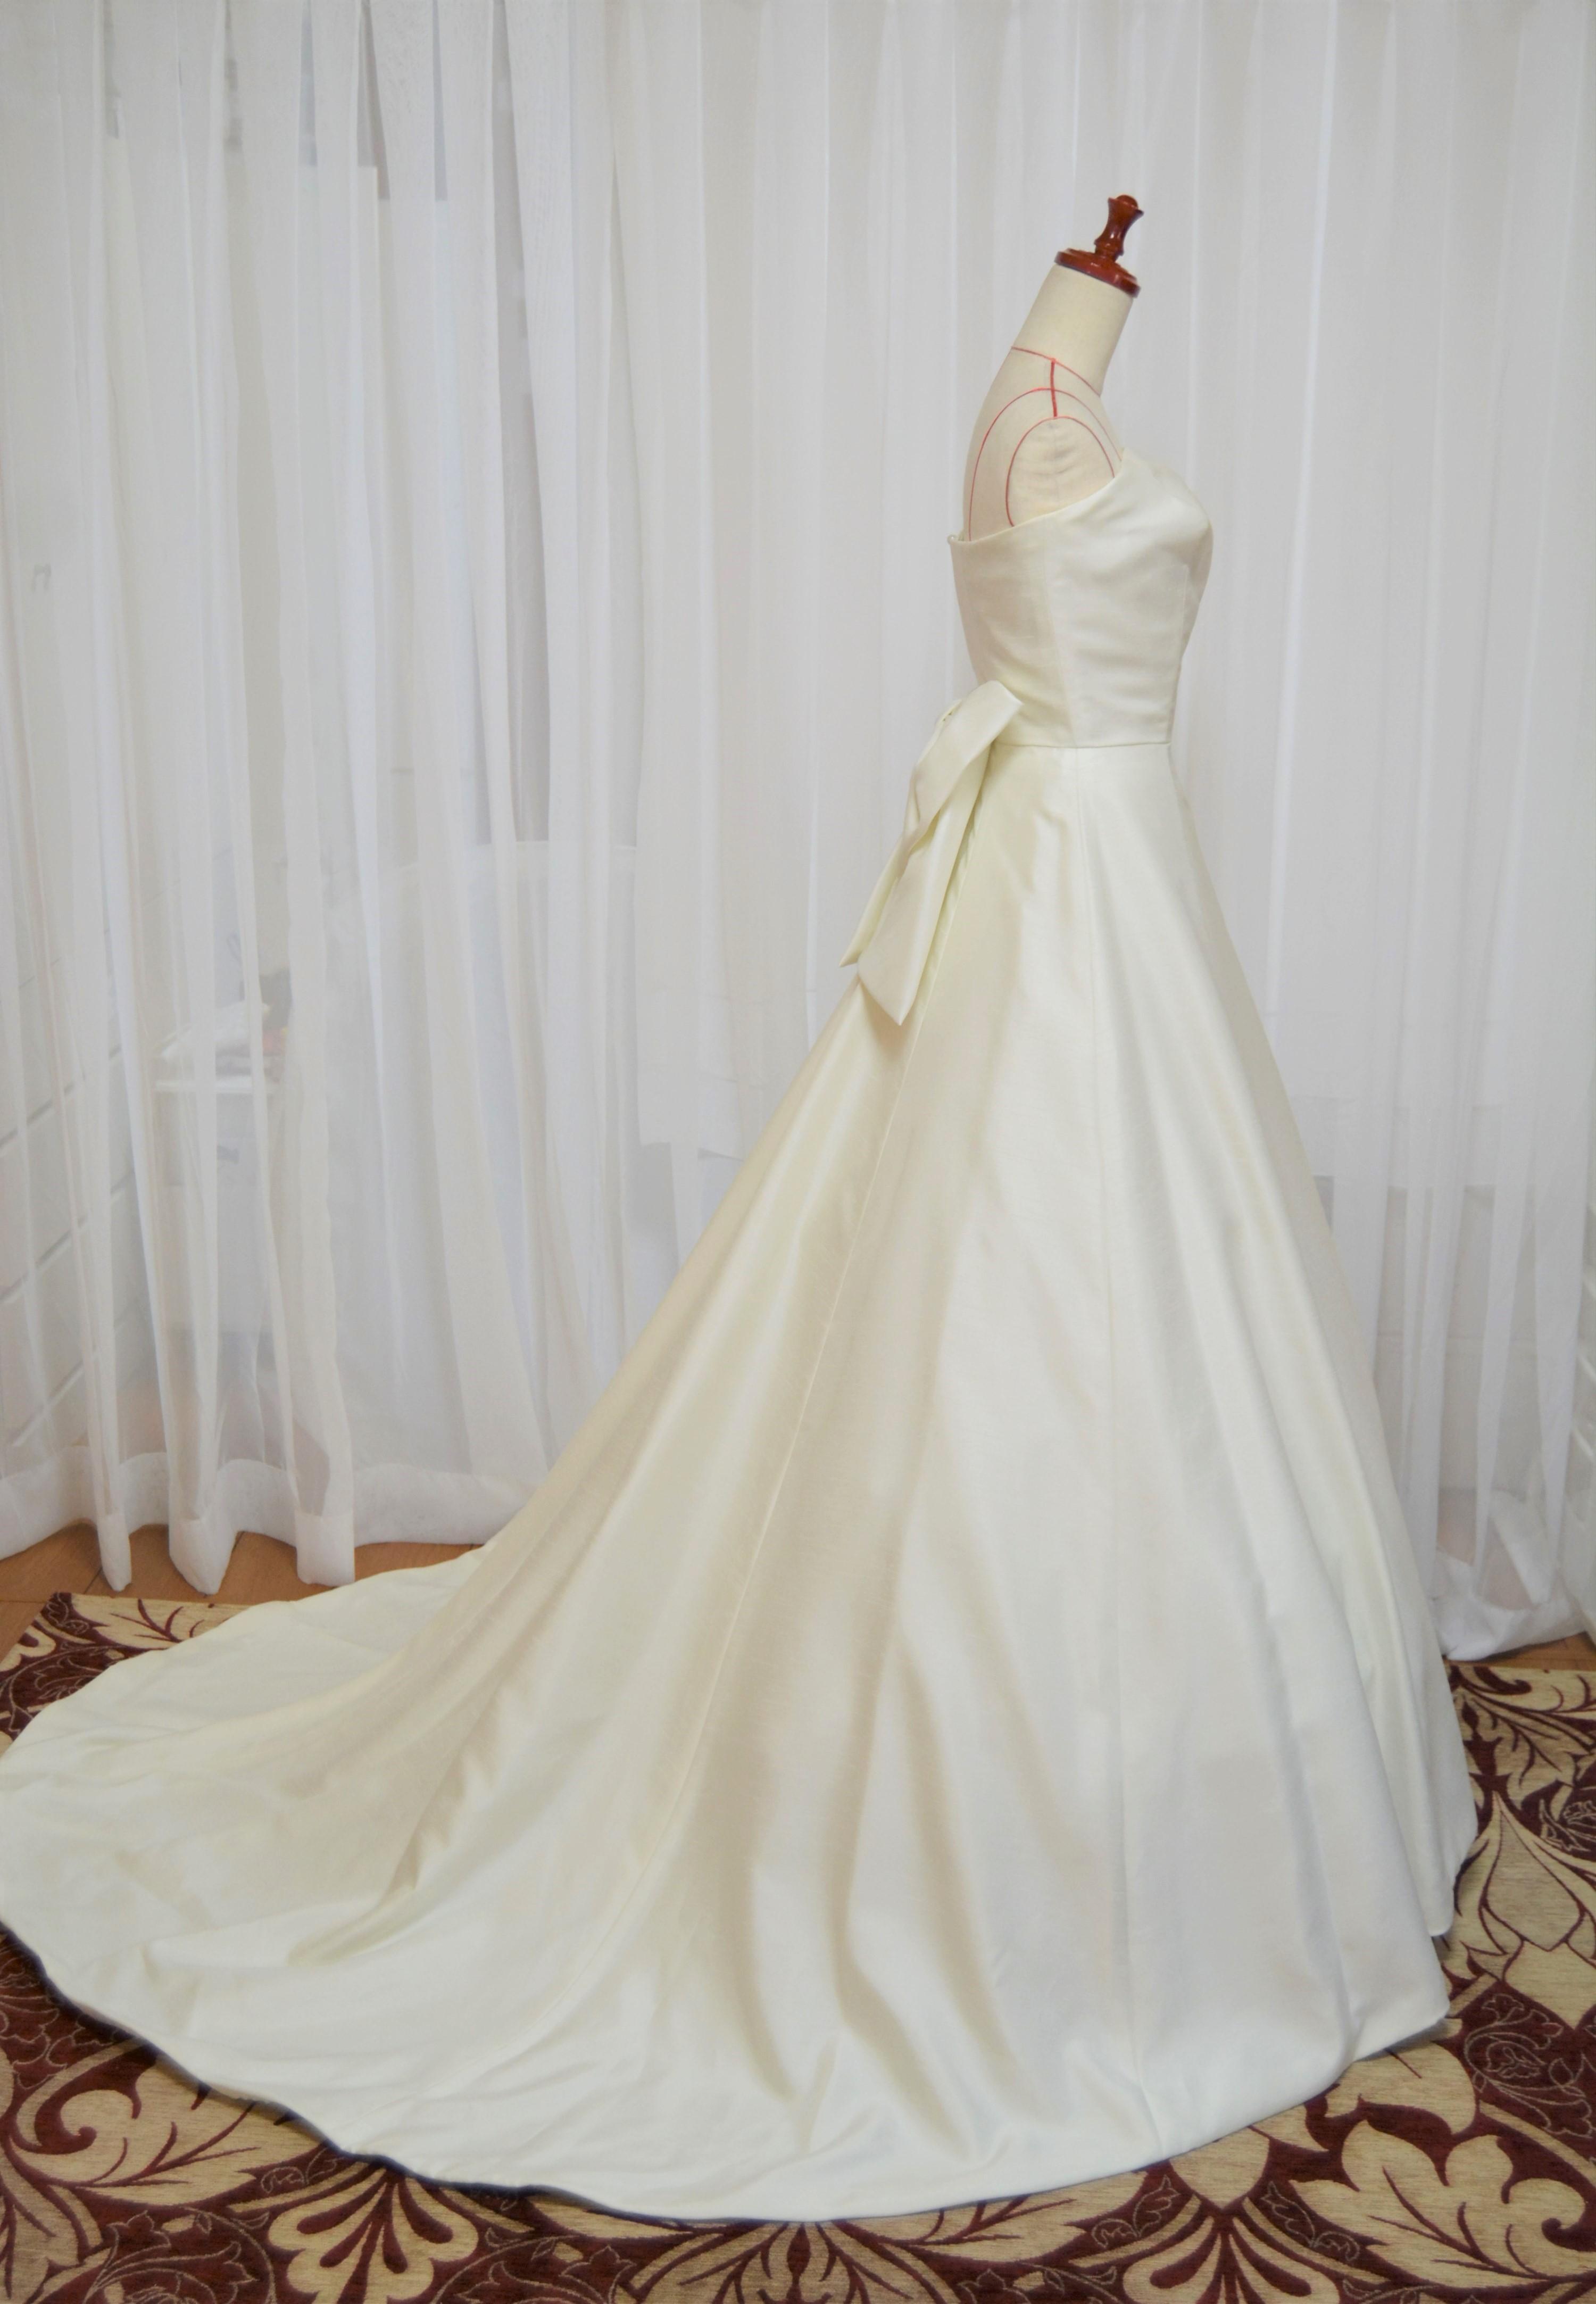 hanayomesalon Aライン ウエディングドレス